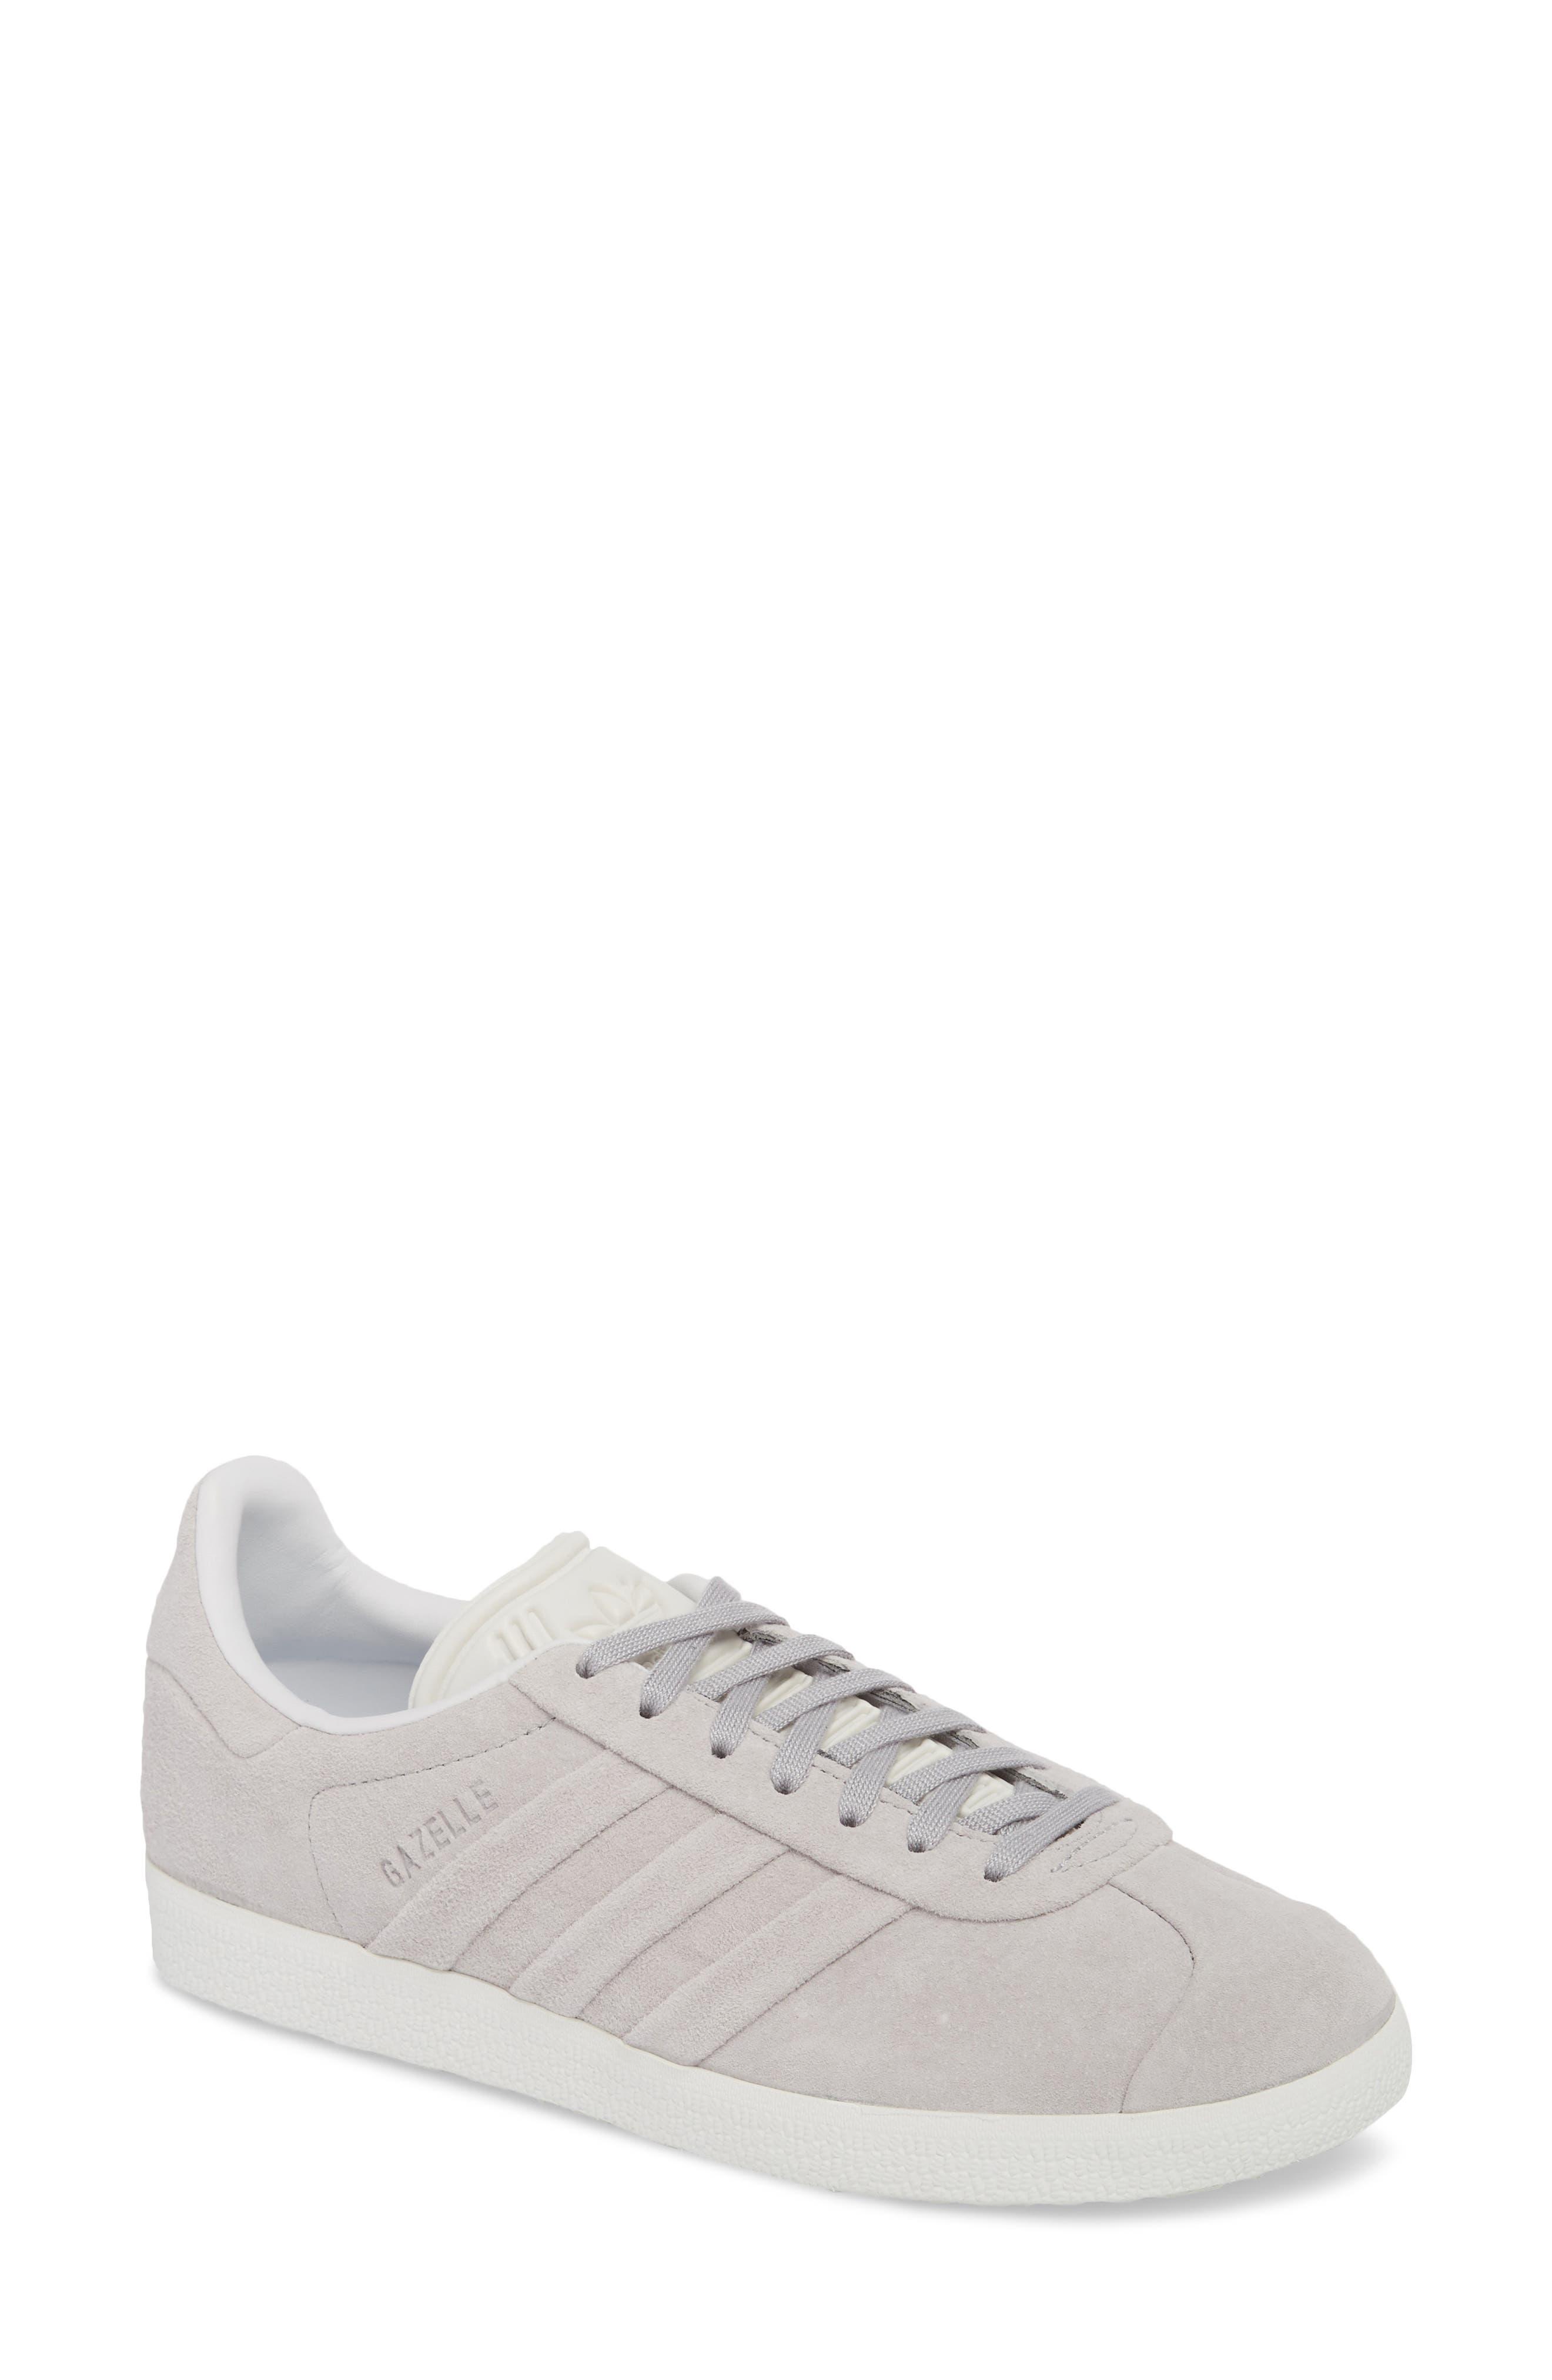 Gazelle Stitch & Turn Sneaker,                             Main thumbnail 1, color,                             GREY/ GREY/ WHITE